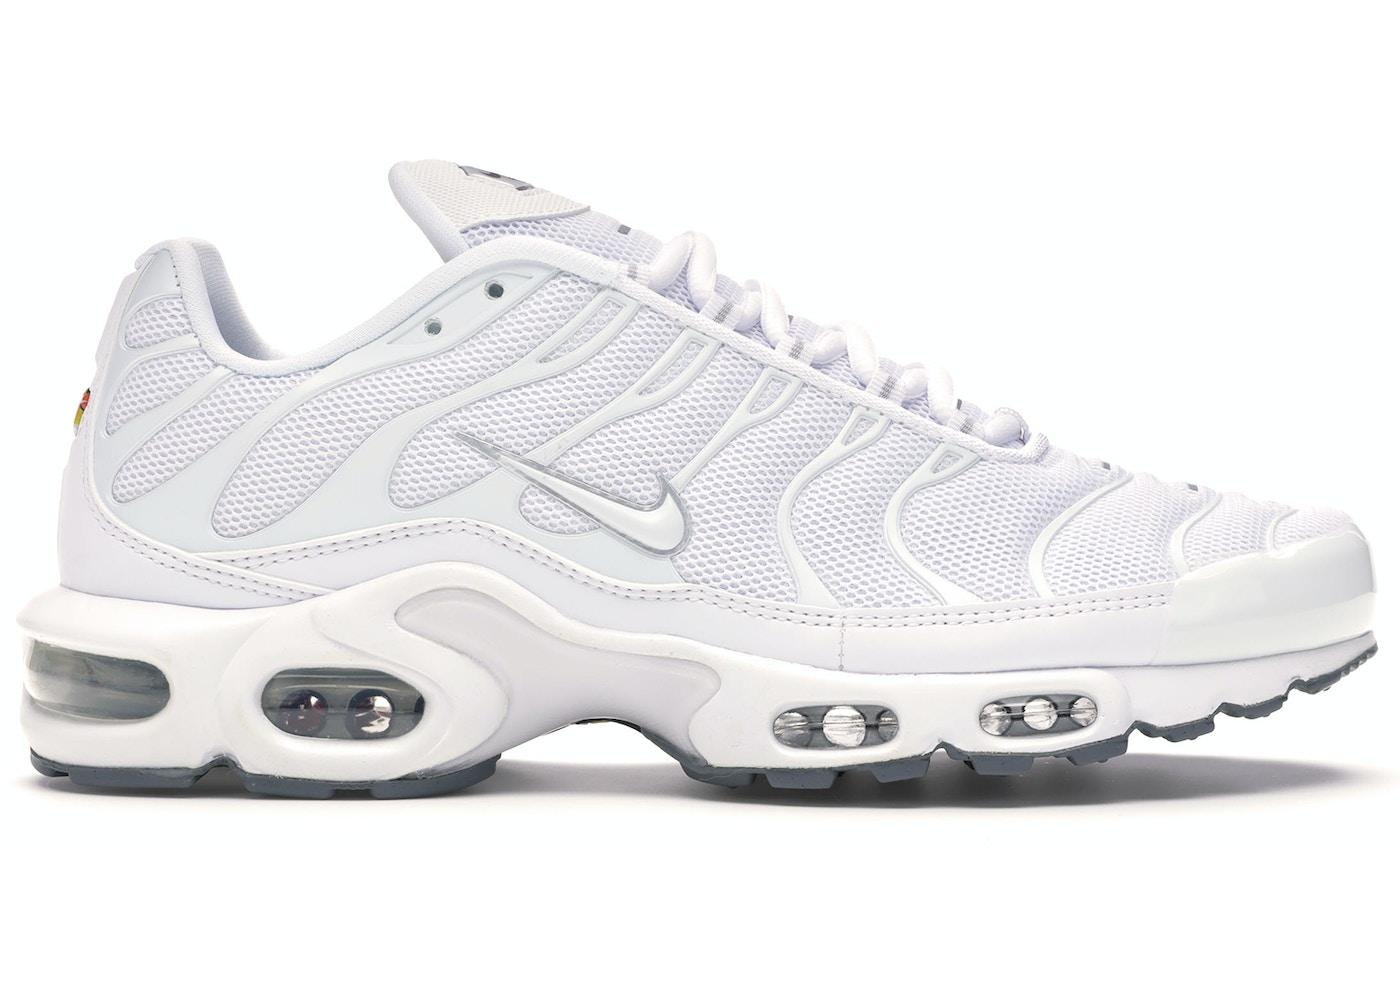 Nike Air Max Plus White 604133 139